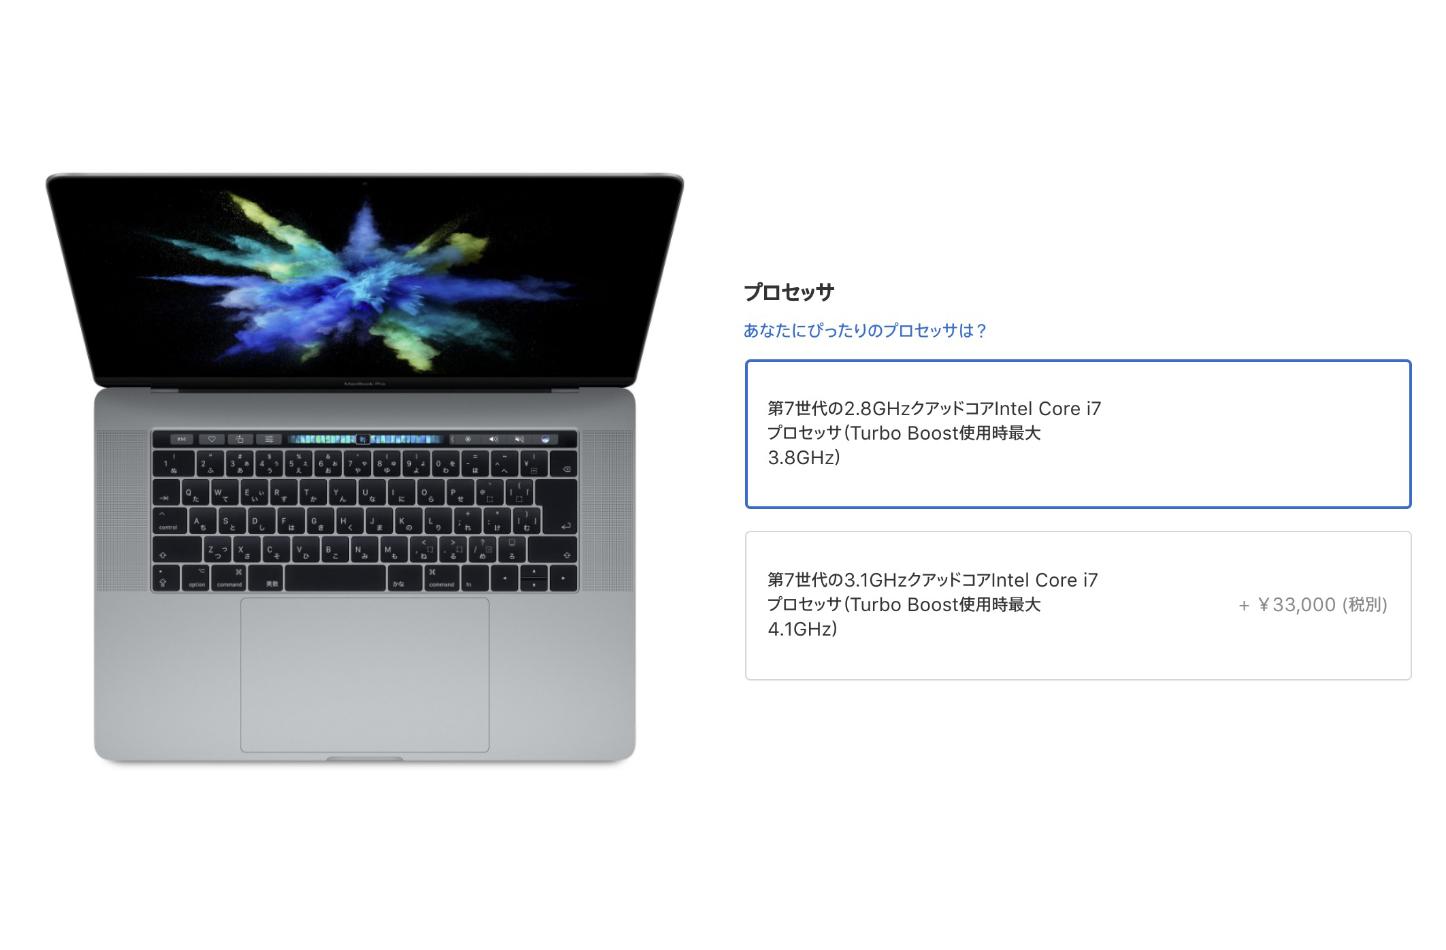 MacBook-Pro-Which-CPU-to-Choose.jpg